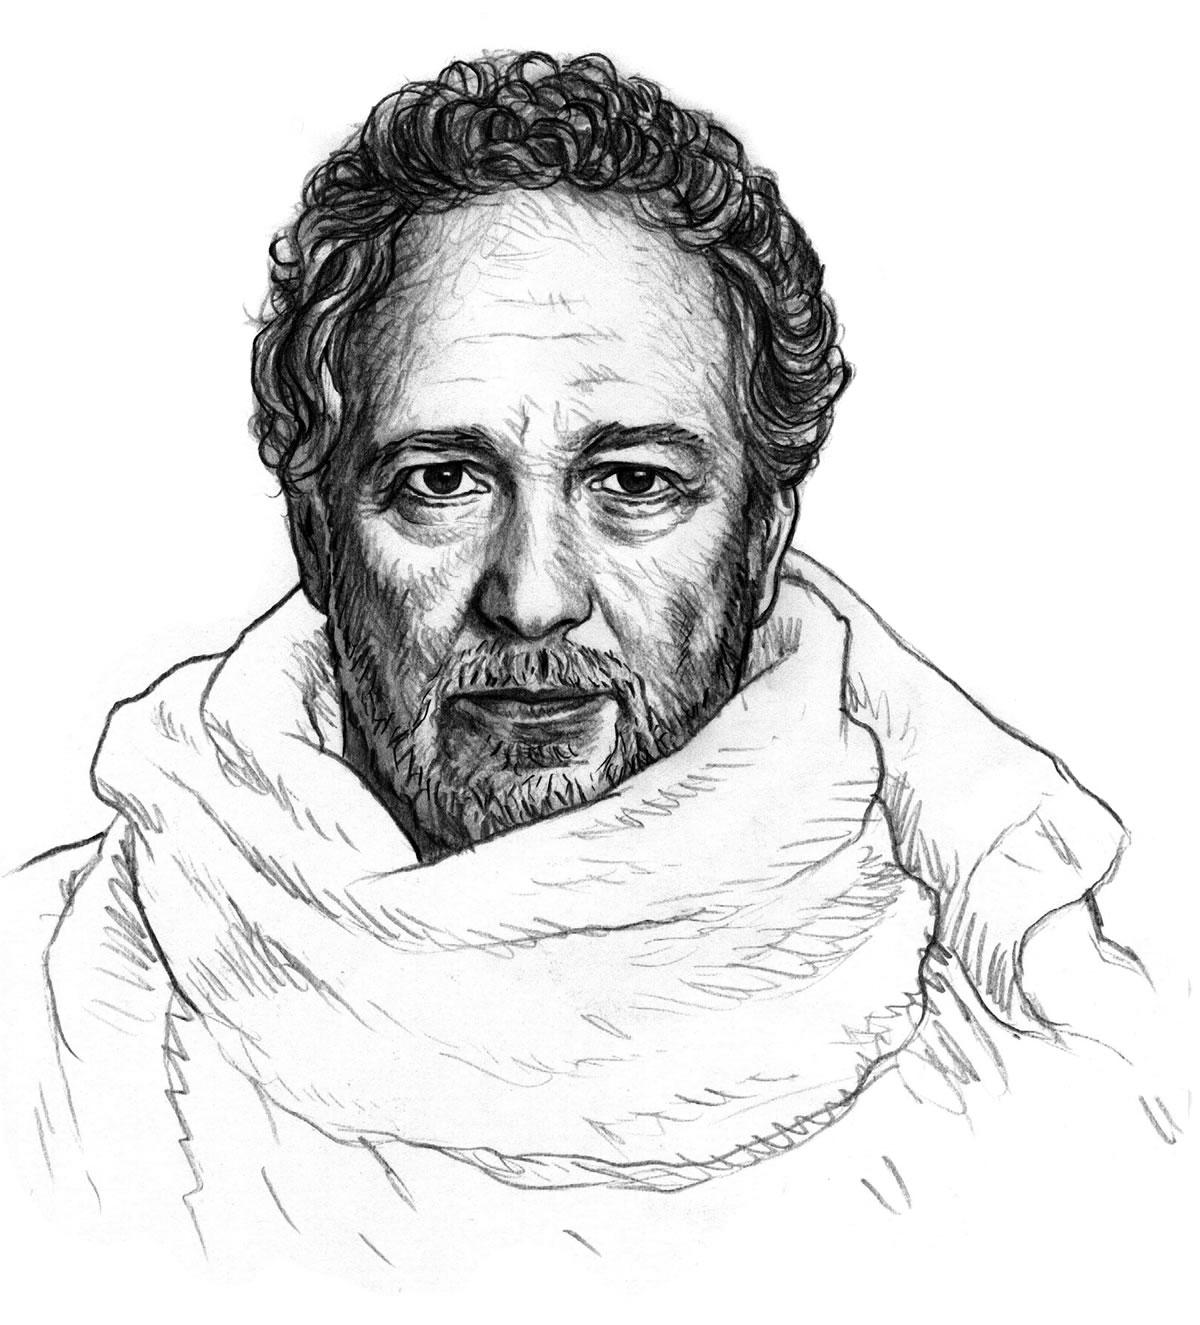 Héctor Abad Faciolince